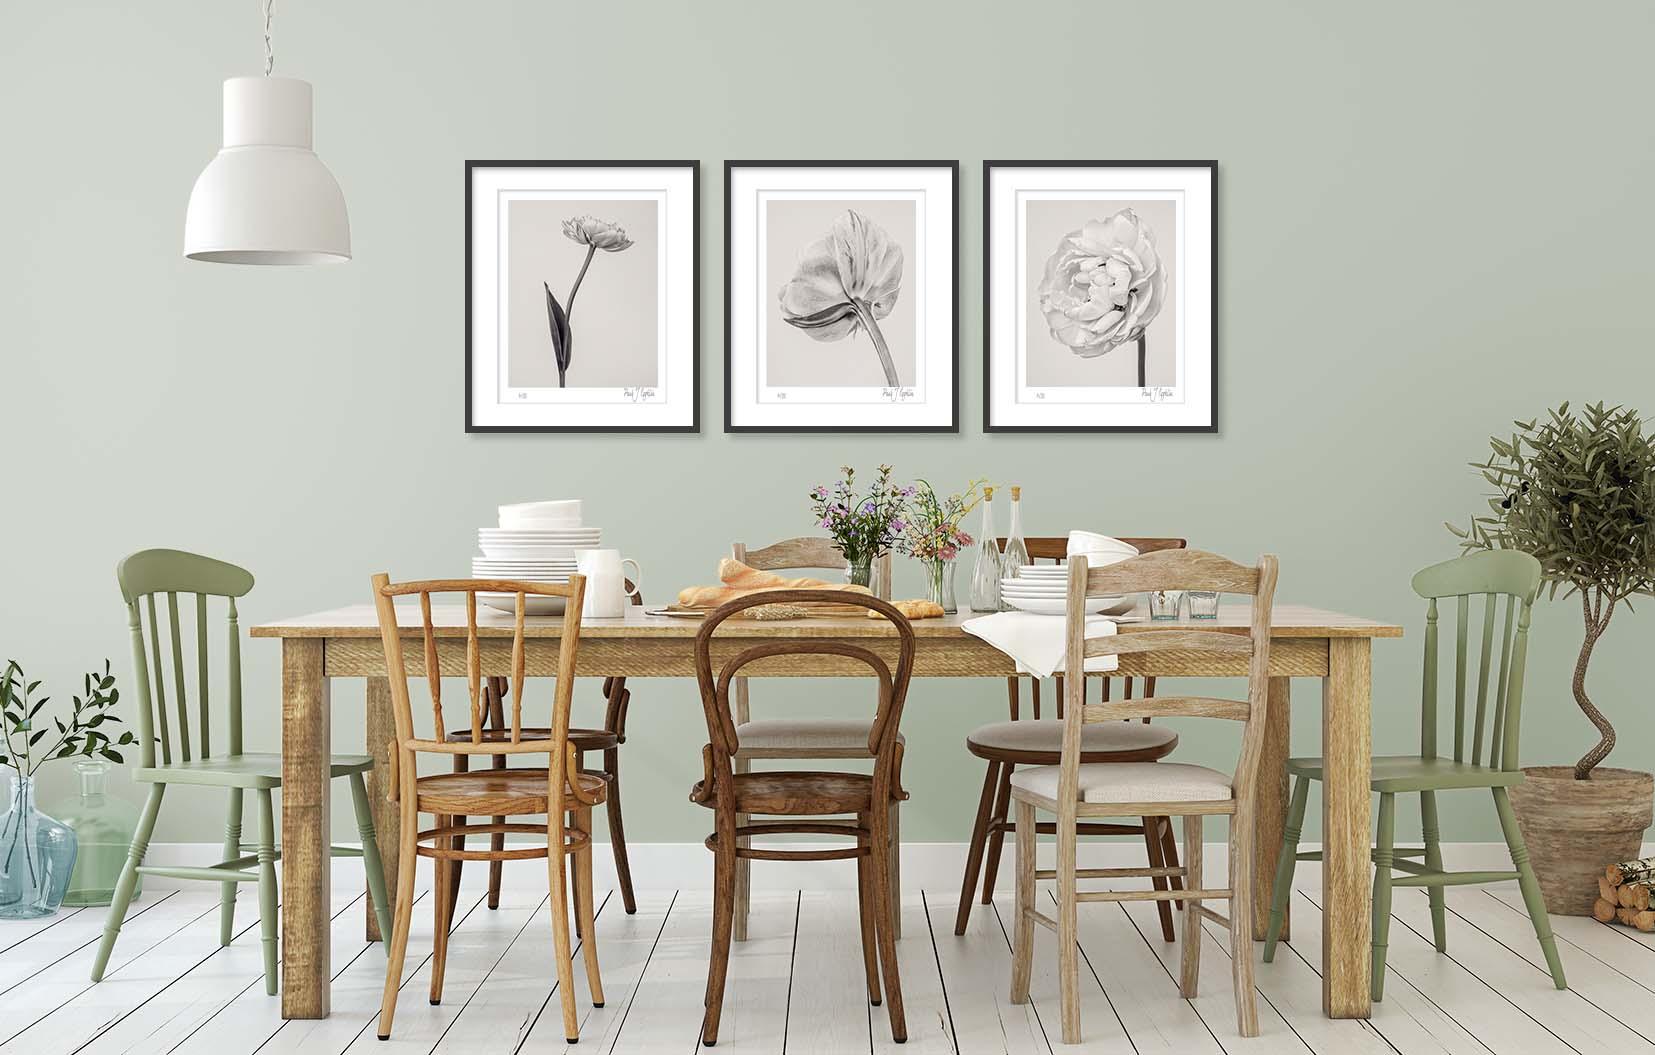 Three photographic prints of tulips: Tulipa 'Yellow Pompenette' I, II & III by award-winning fine art photographer Paul Coghlin FBIPP.